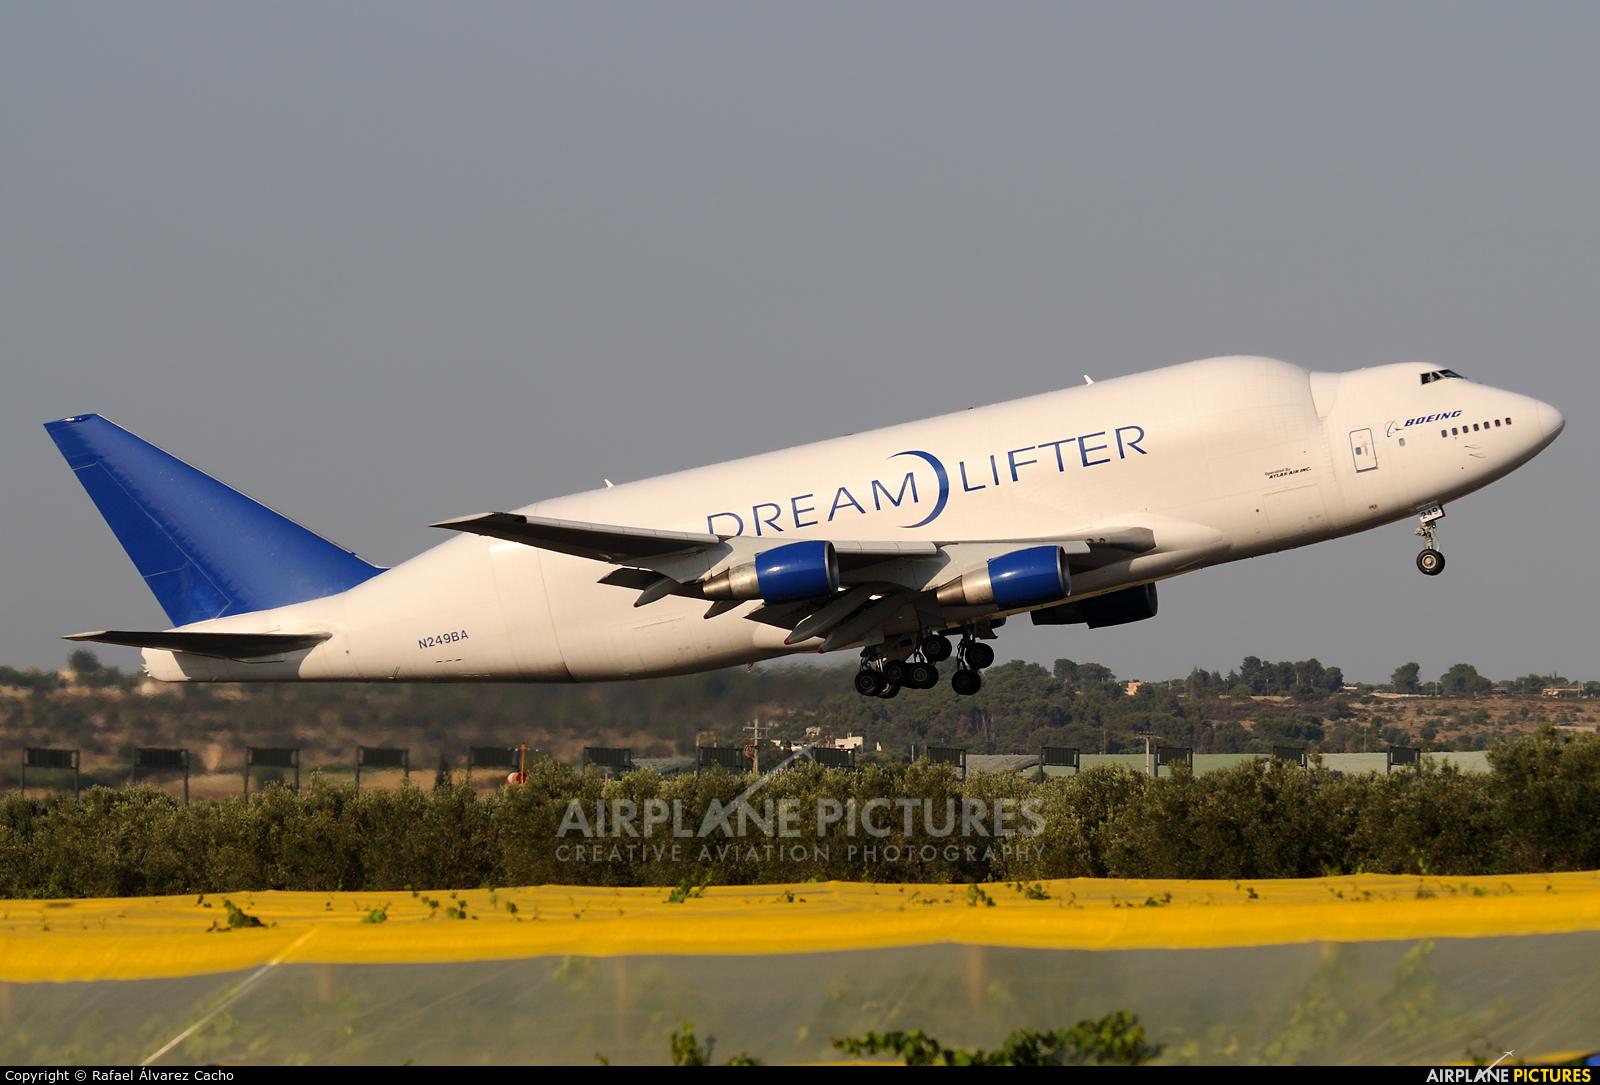 Boeing Company N249BA aircraft at Taranto-Grottaglie Airport